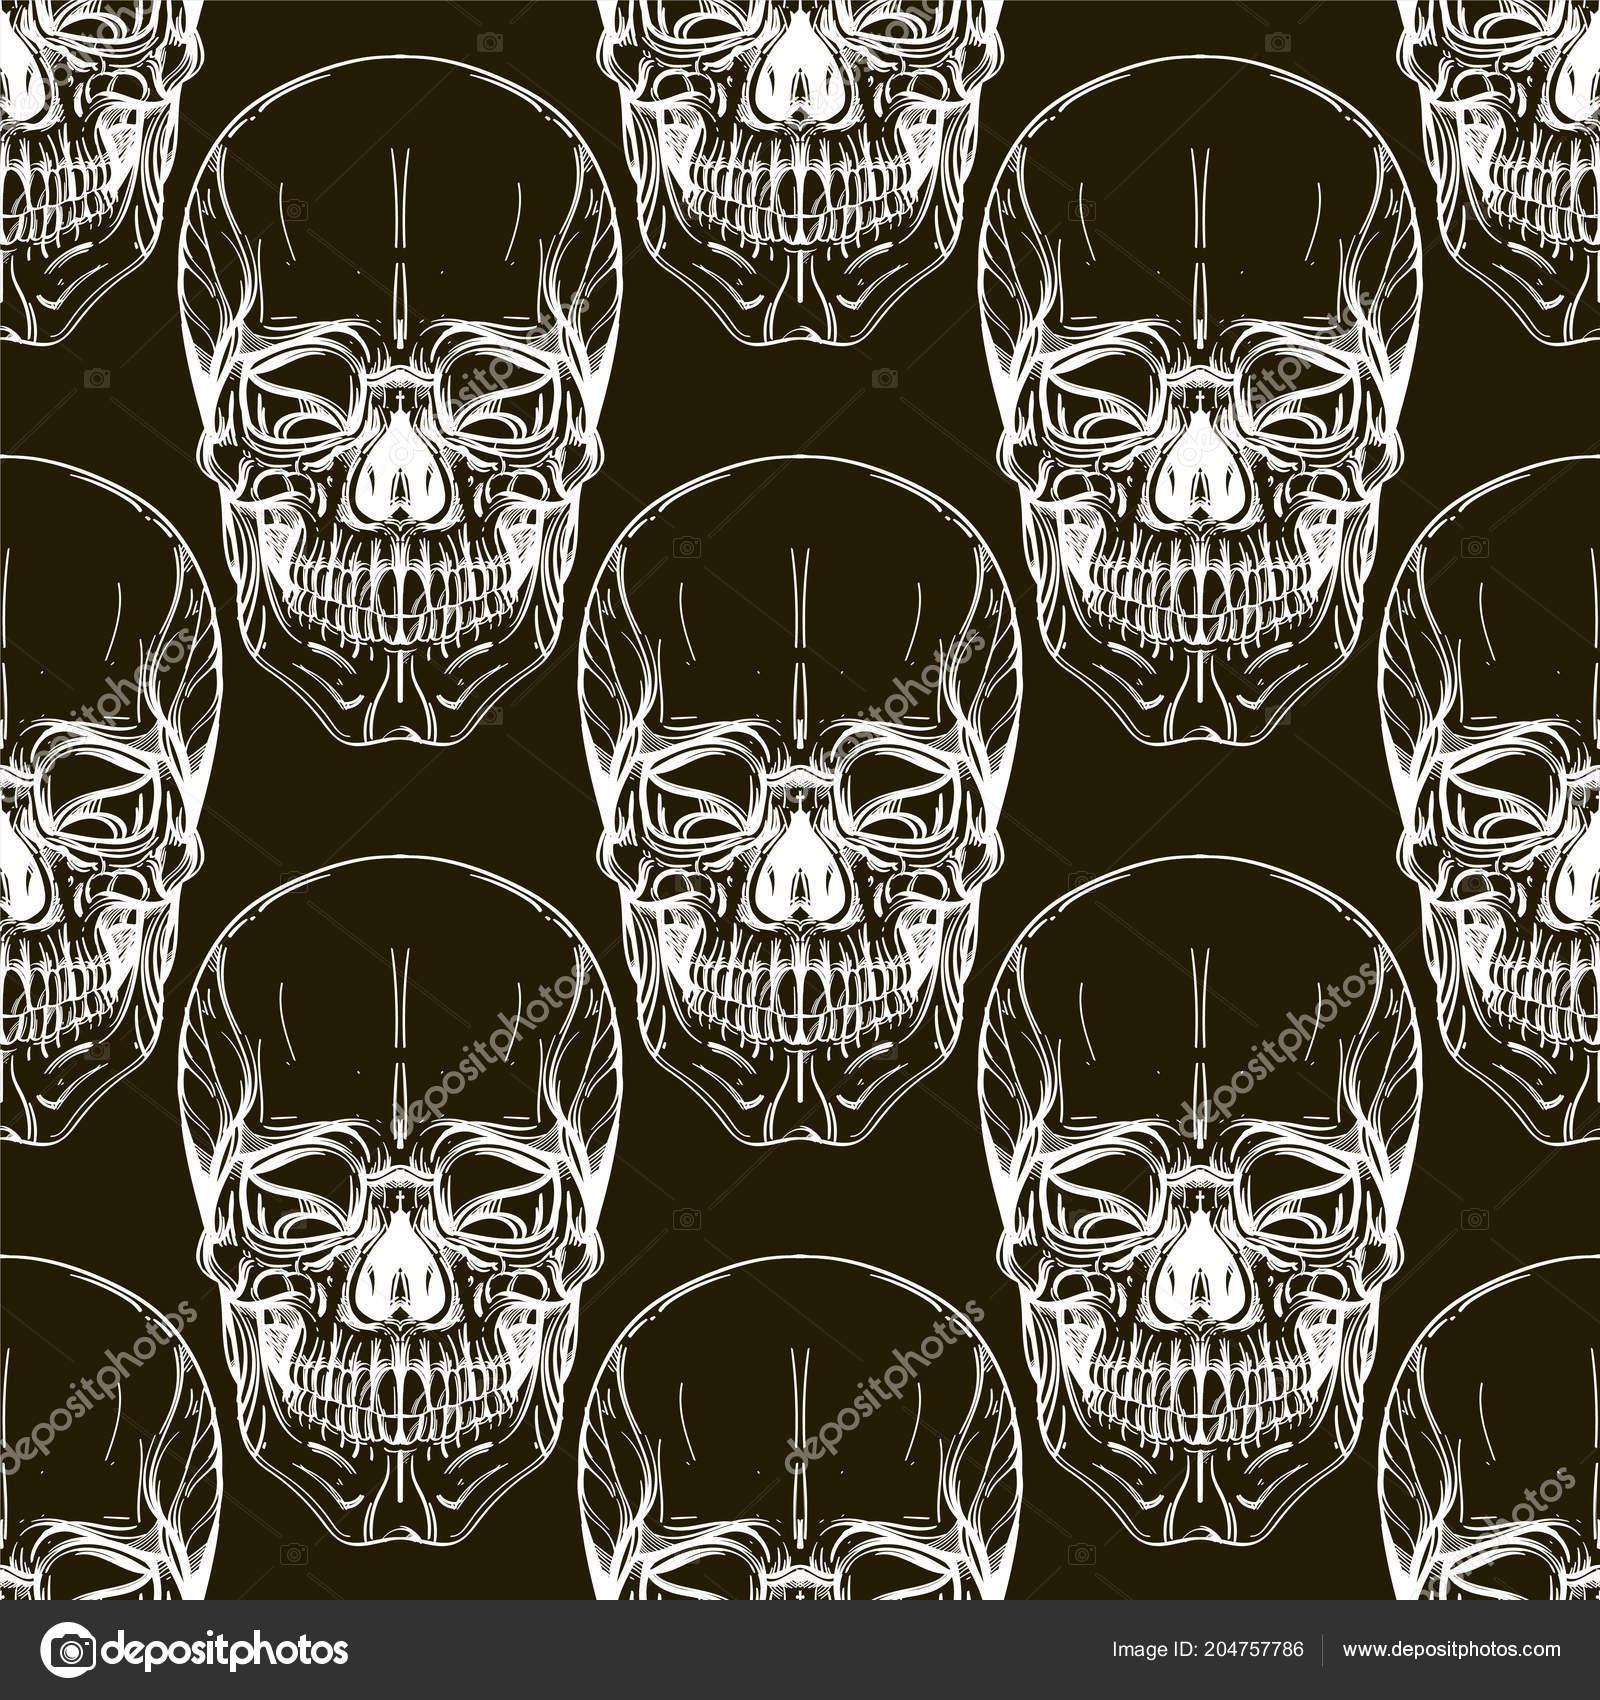 Wallpapers Skull Seamless Pattern Human Skulls Wallpapers